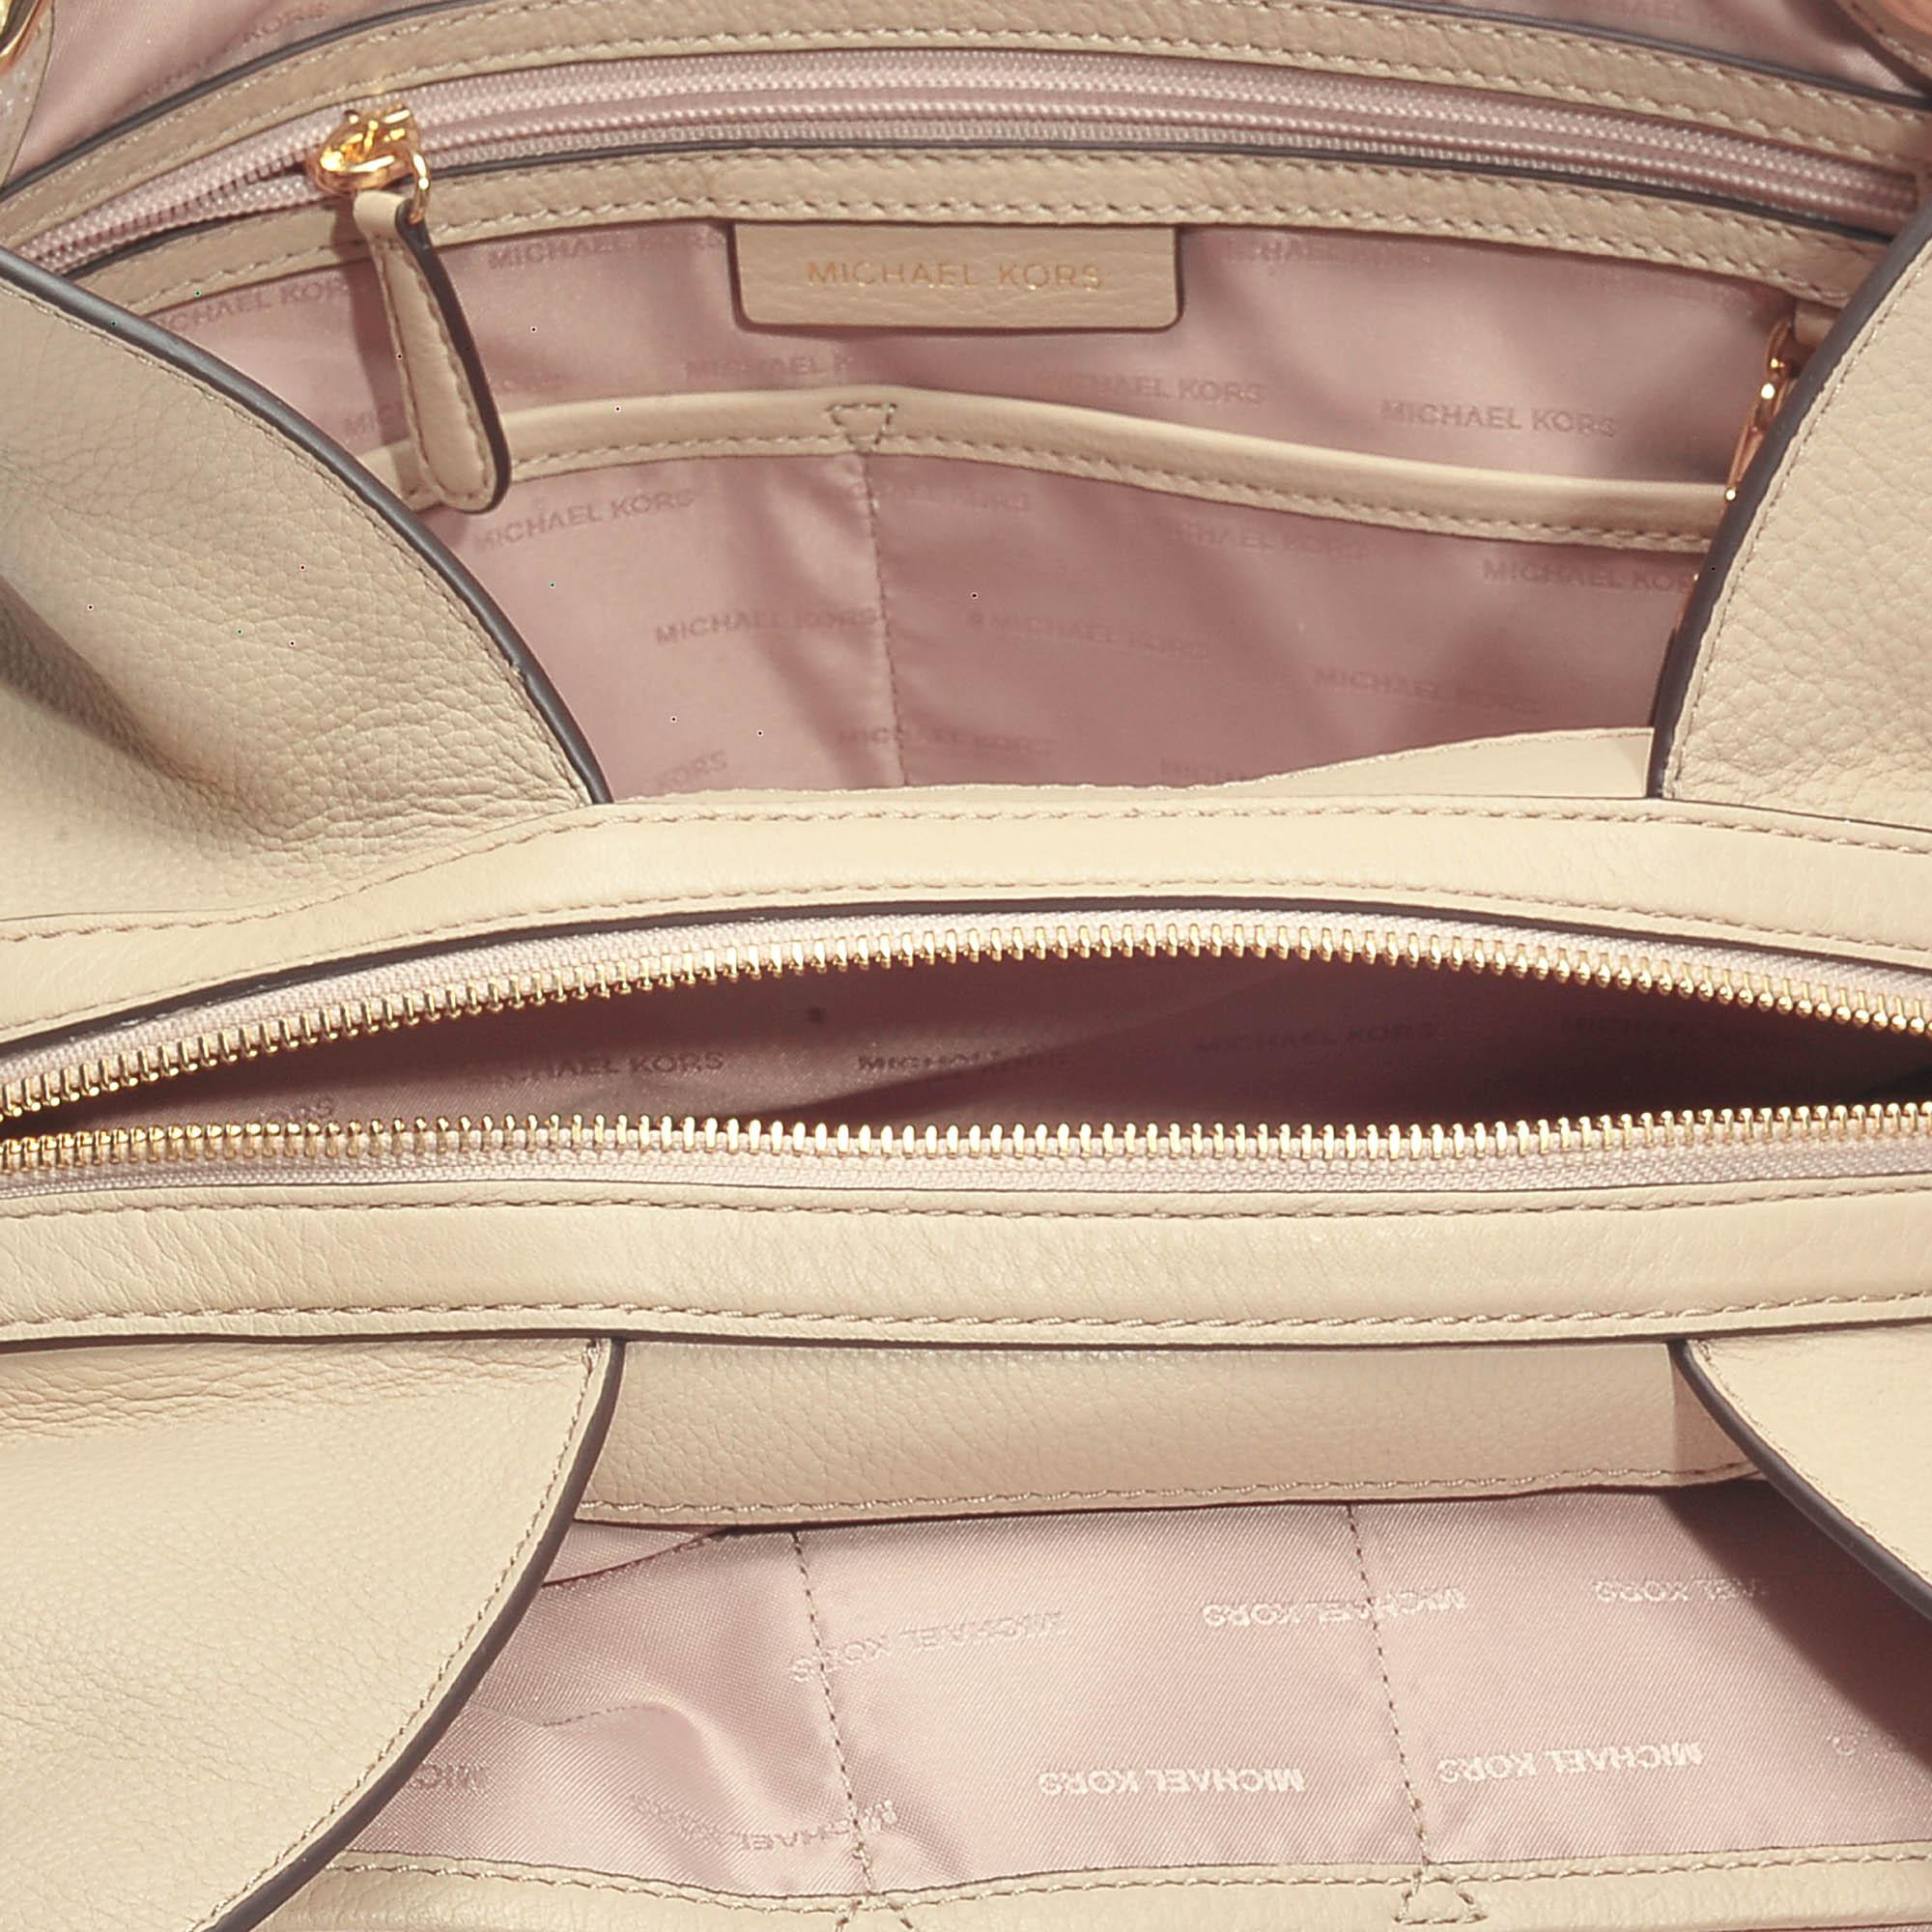 MICHAEL Michael Kors Leather Raven Large Shoulder Tote Bag In Oat Small Pebble